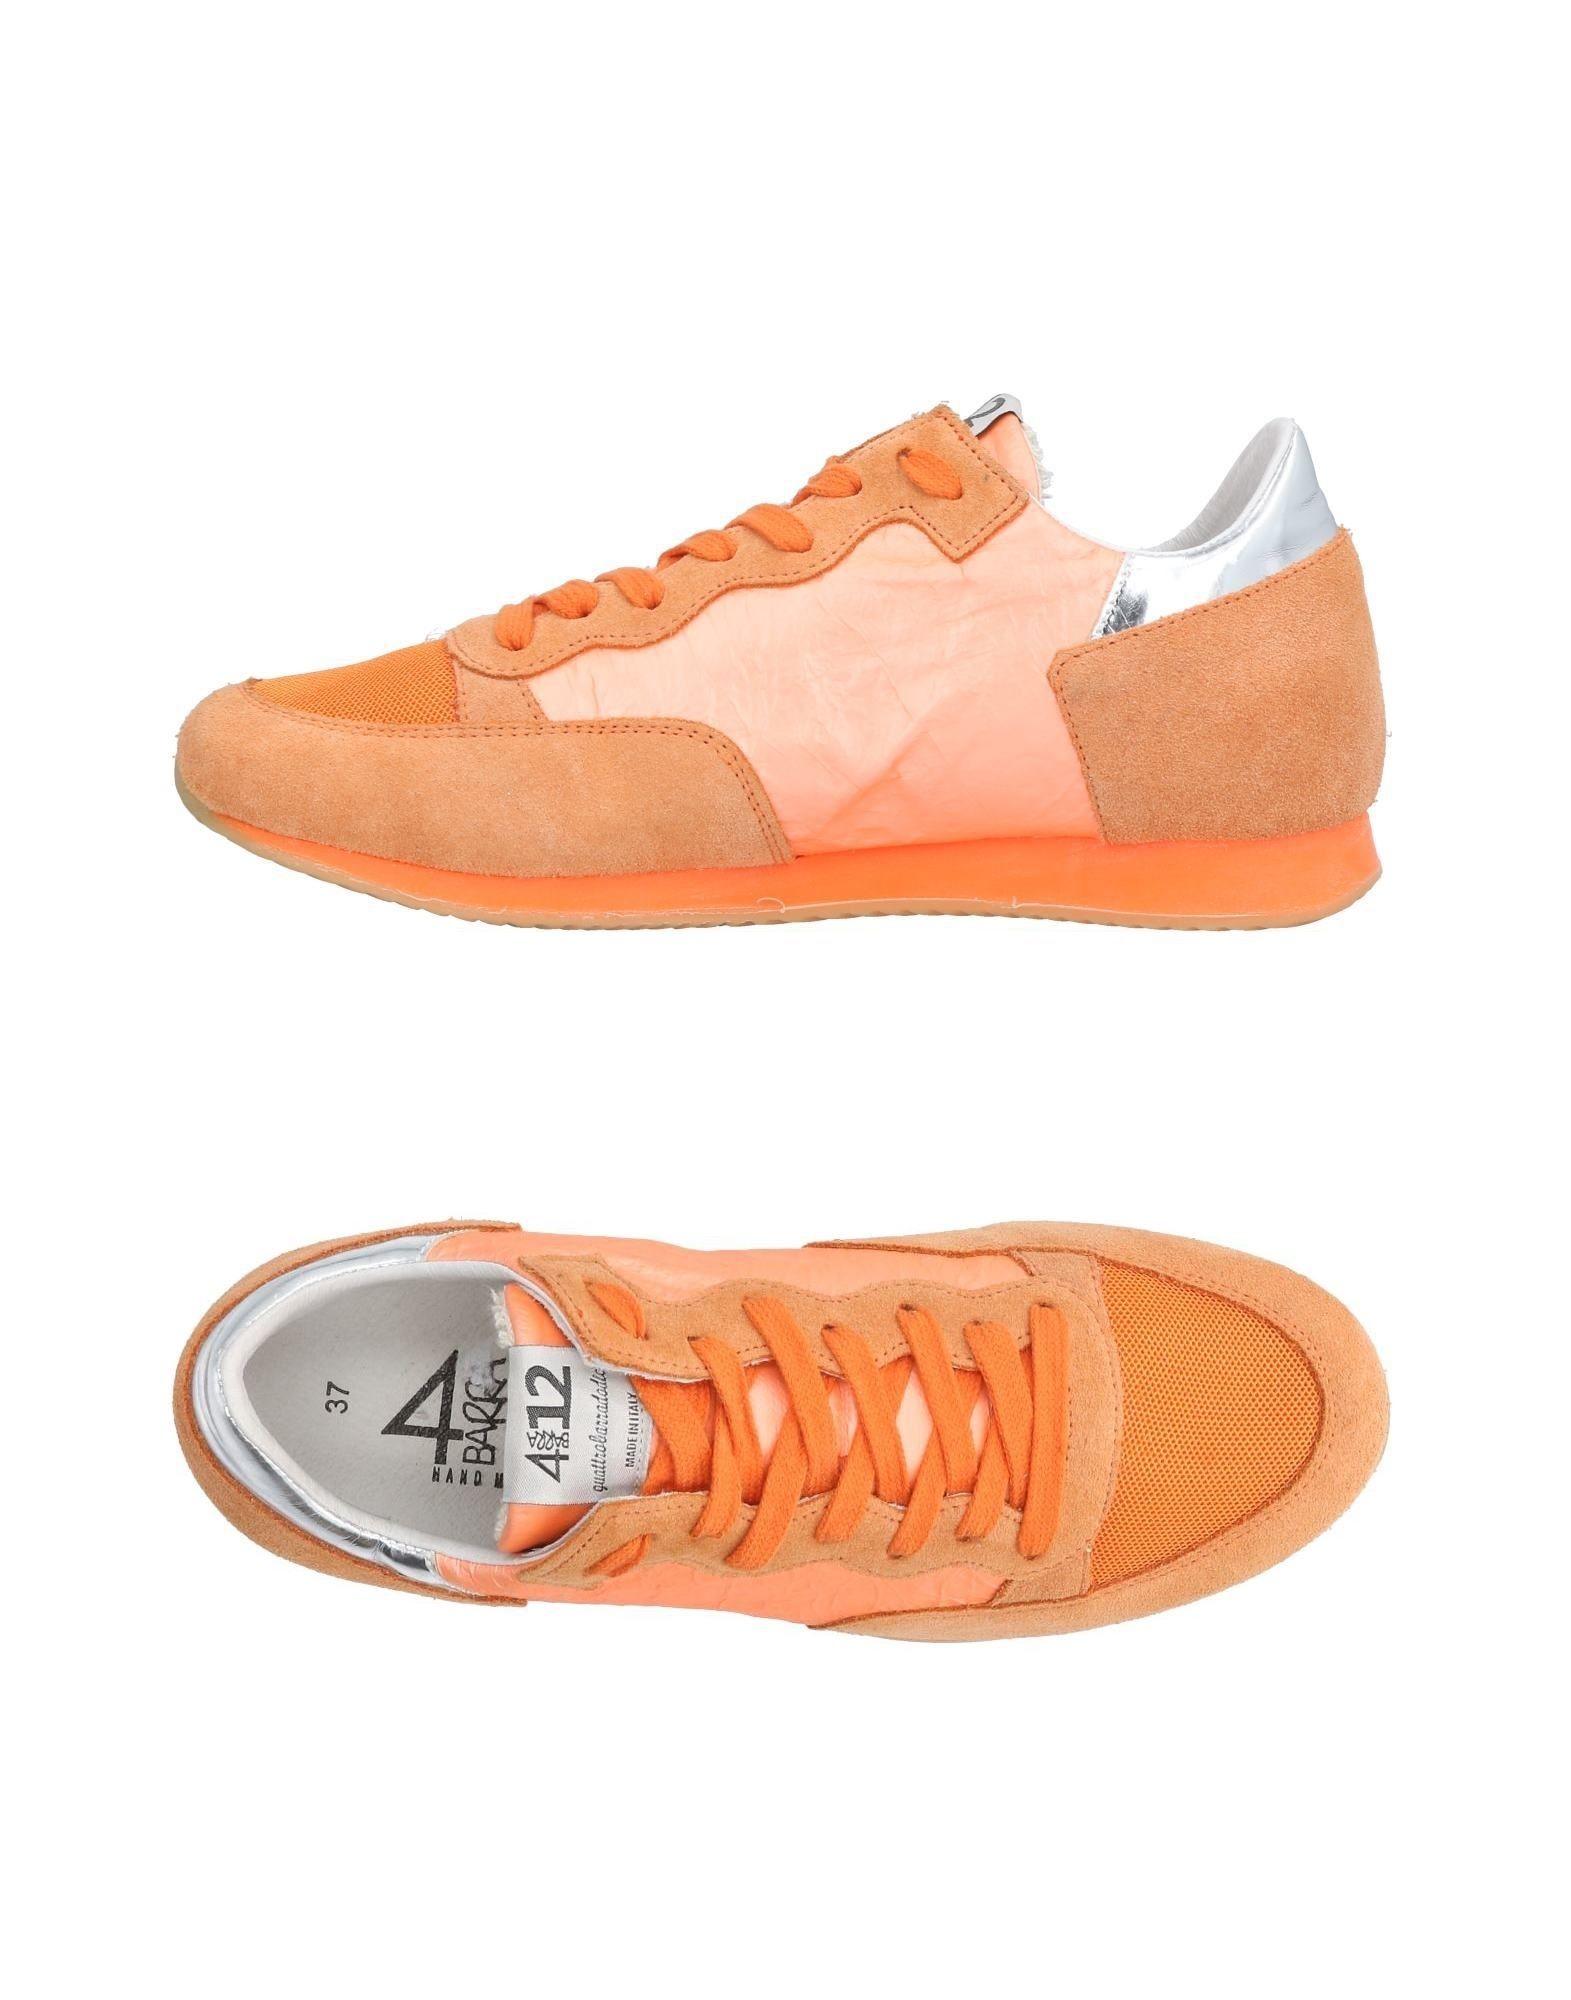 Quattrobarradodici Sneakers Damen  11434557KO Gute Qualität beliebte Schuhe